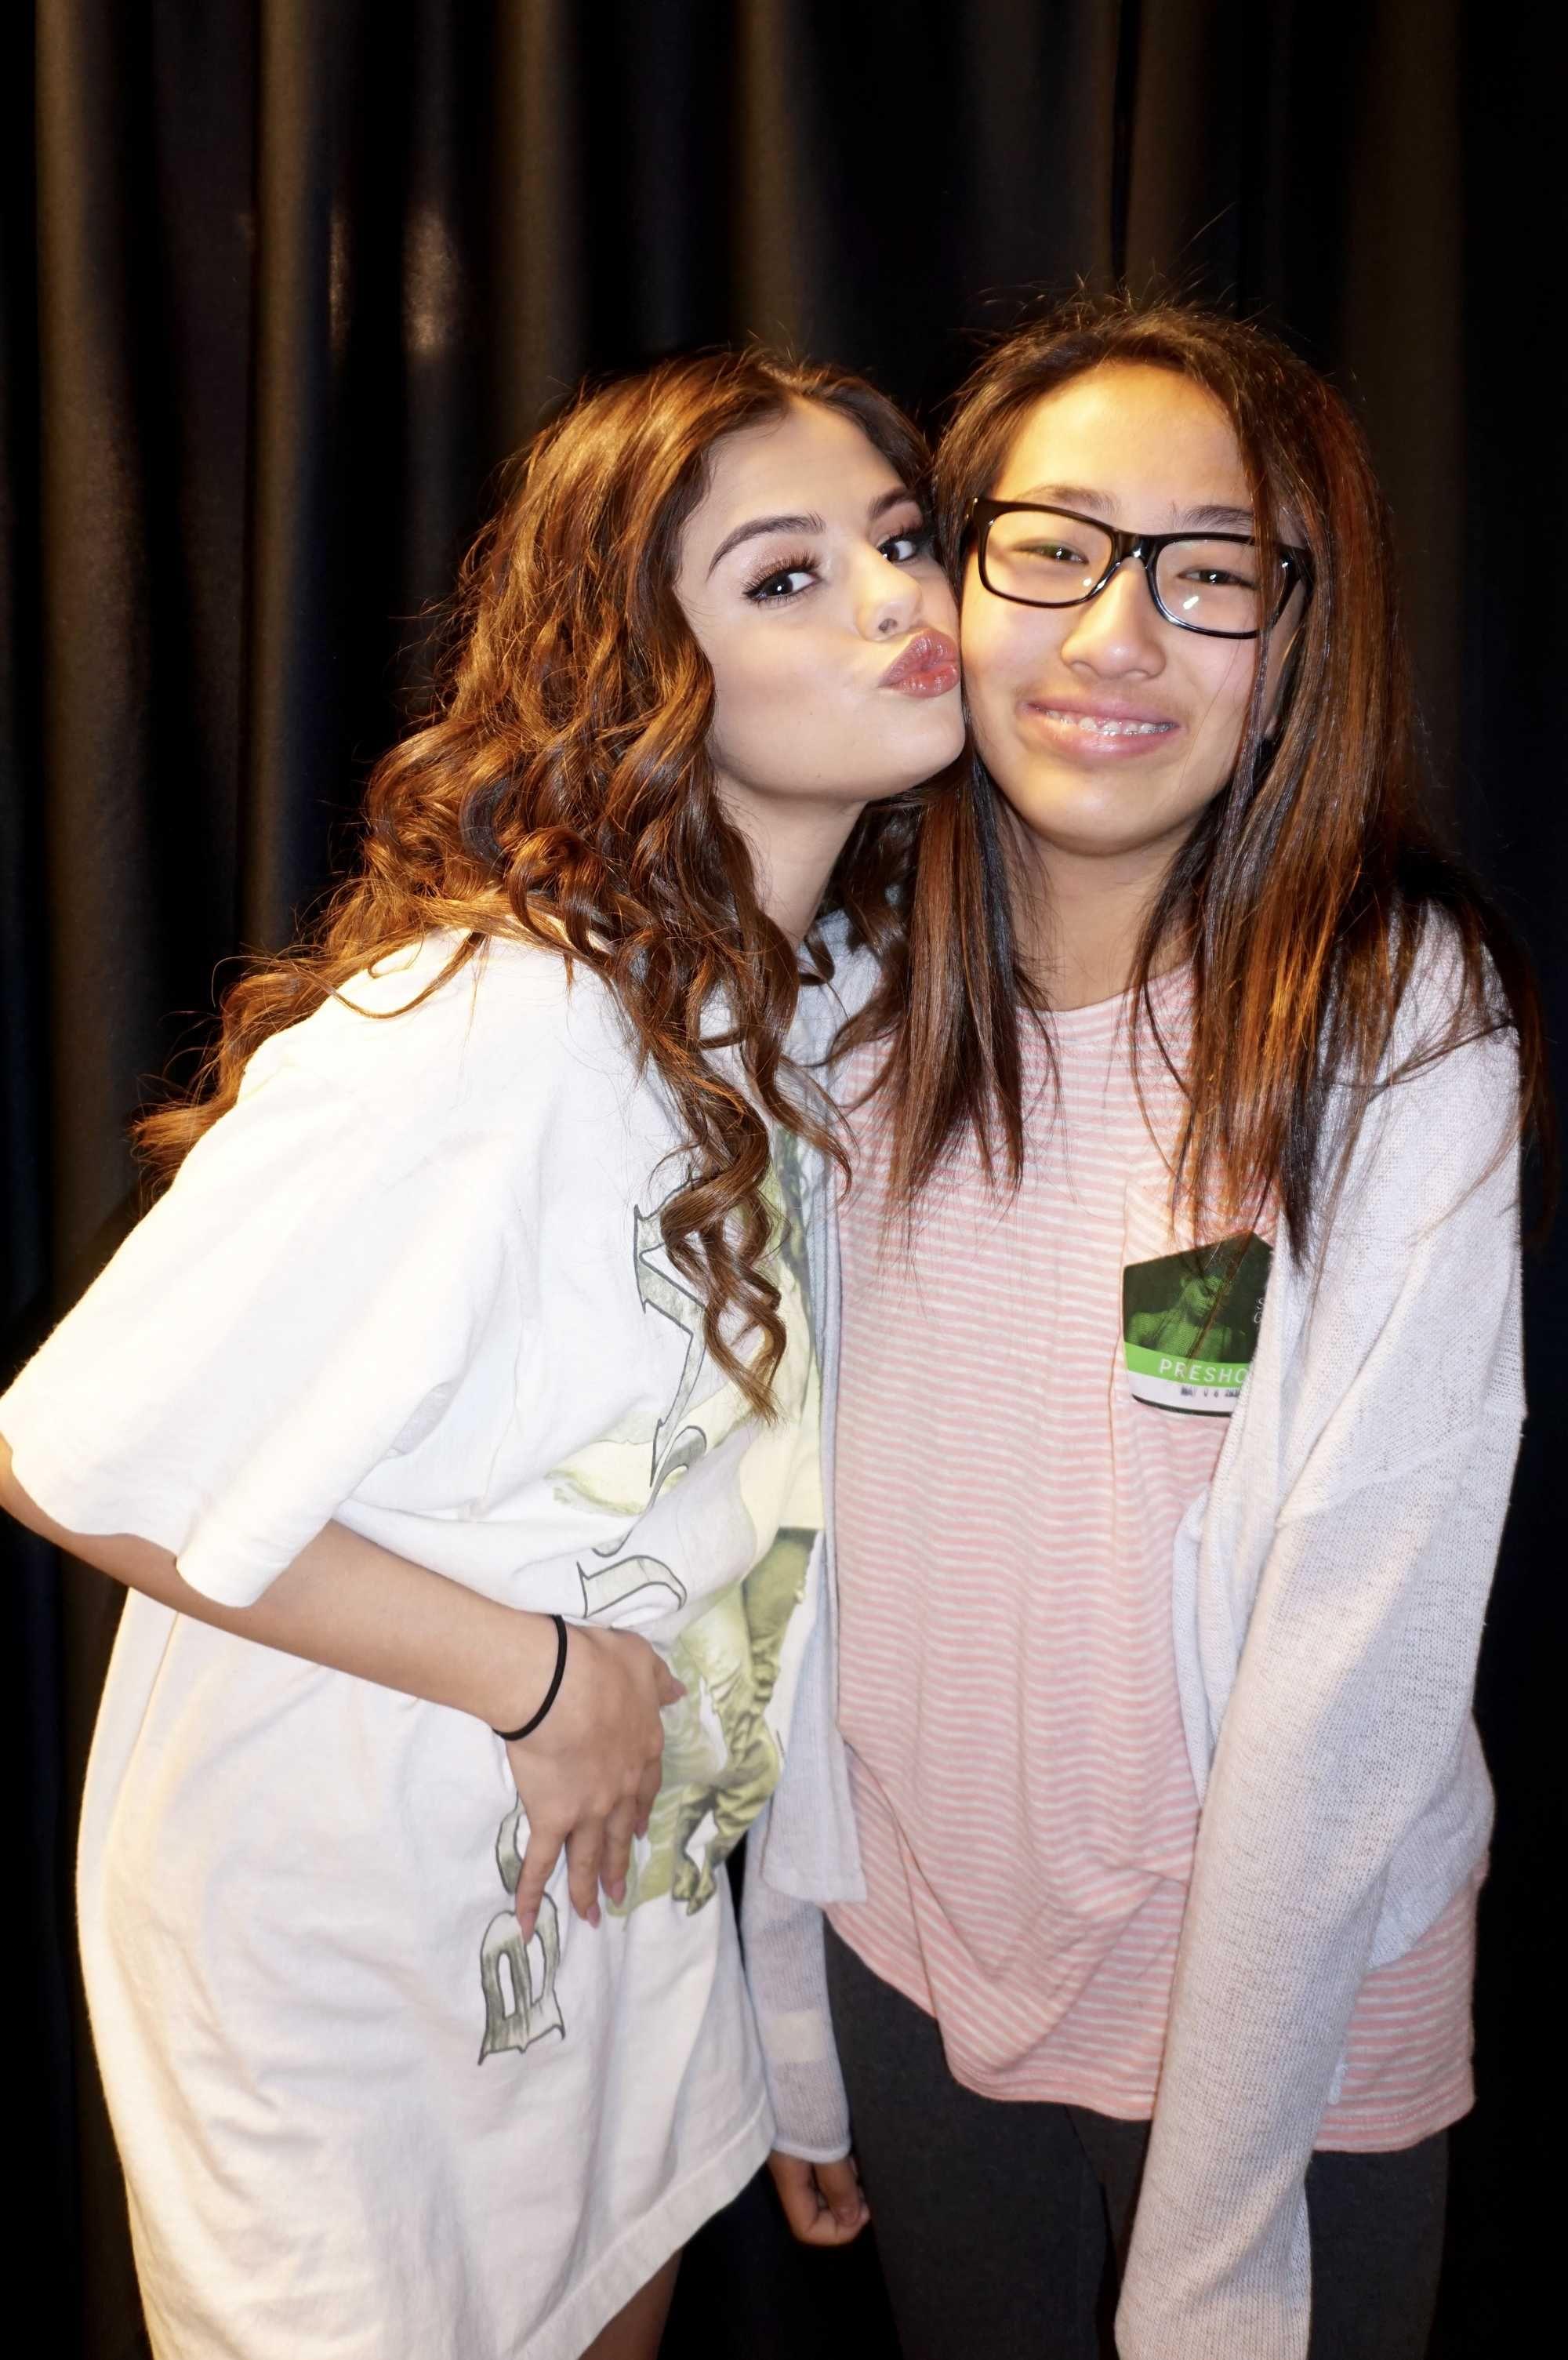 Selena gomez tours concerts revival tour 2016 2017 meet selena gomez tours concerts revival tour 2016 2017 meet greet kristyandbryce Image collections